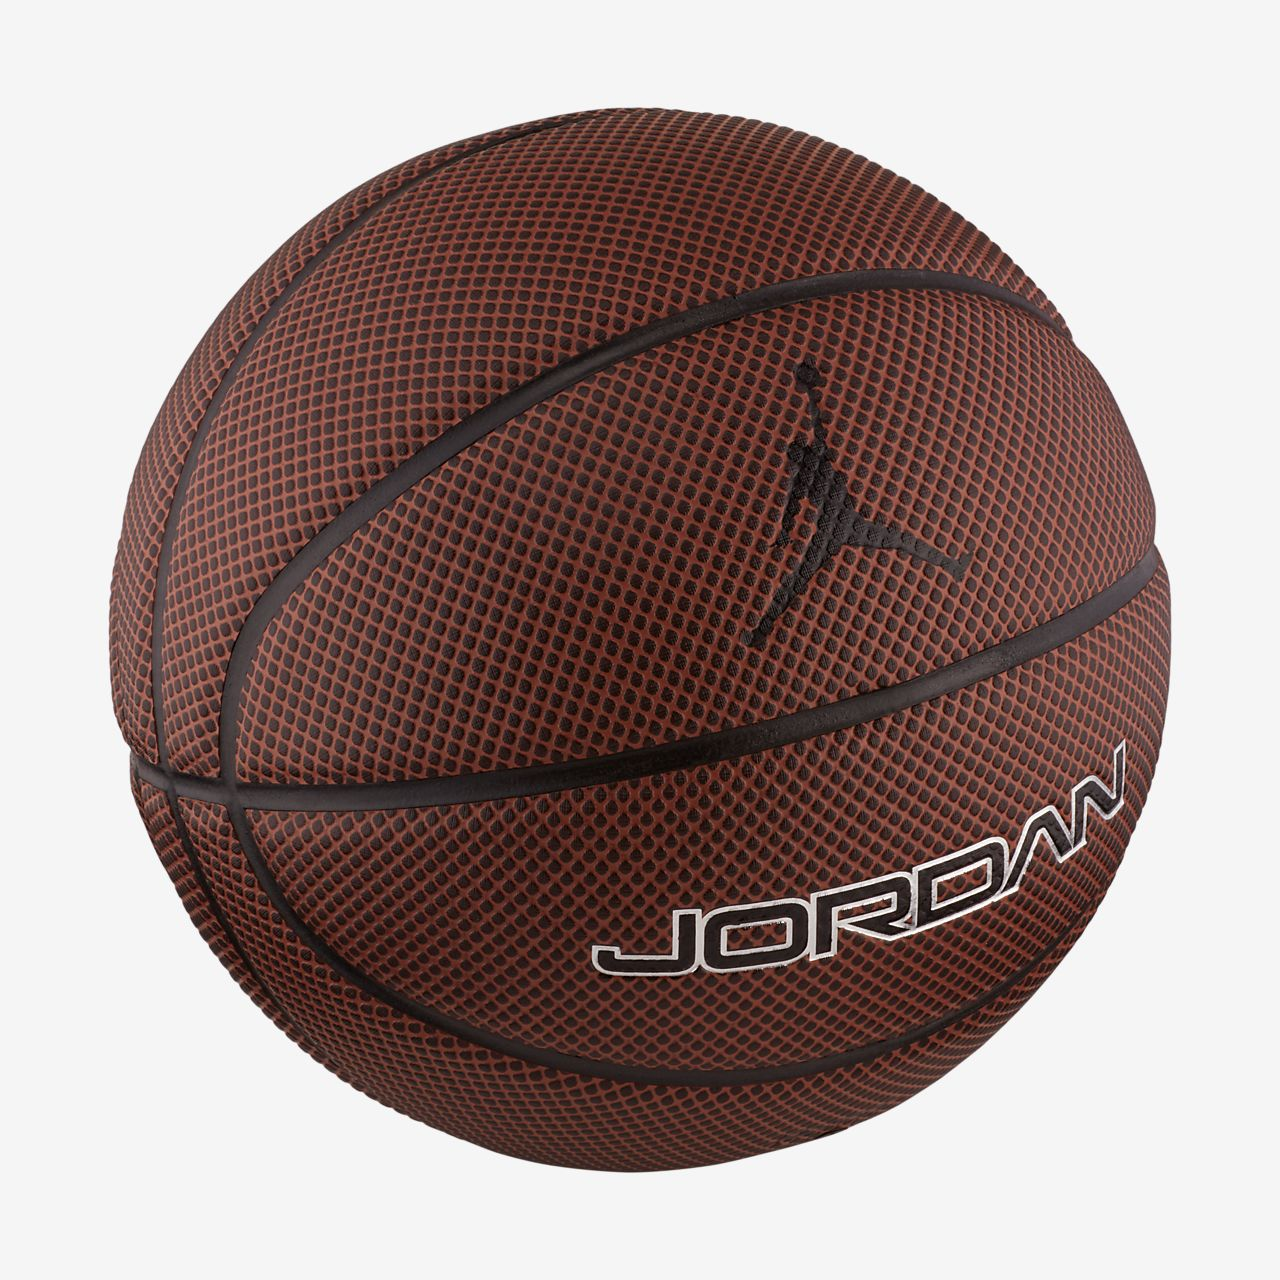 d059274d Piłka do koszykówki Jordan Legacy 8P (rozmiar 7). Nike.com PL